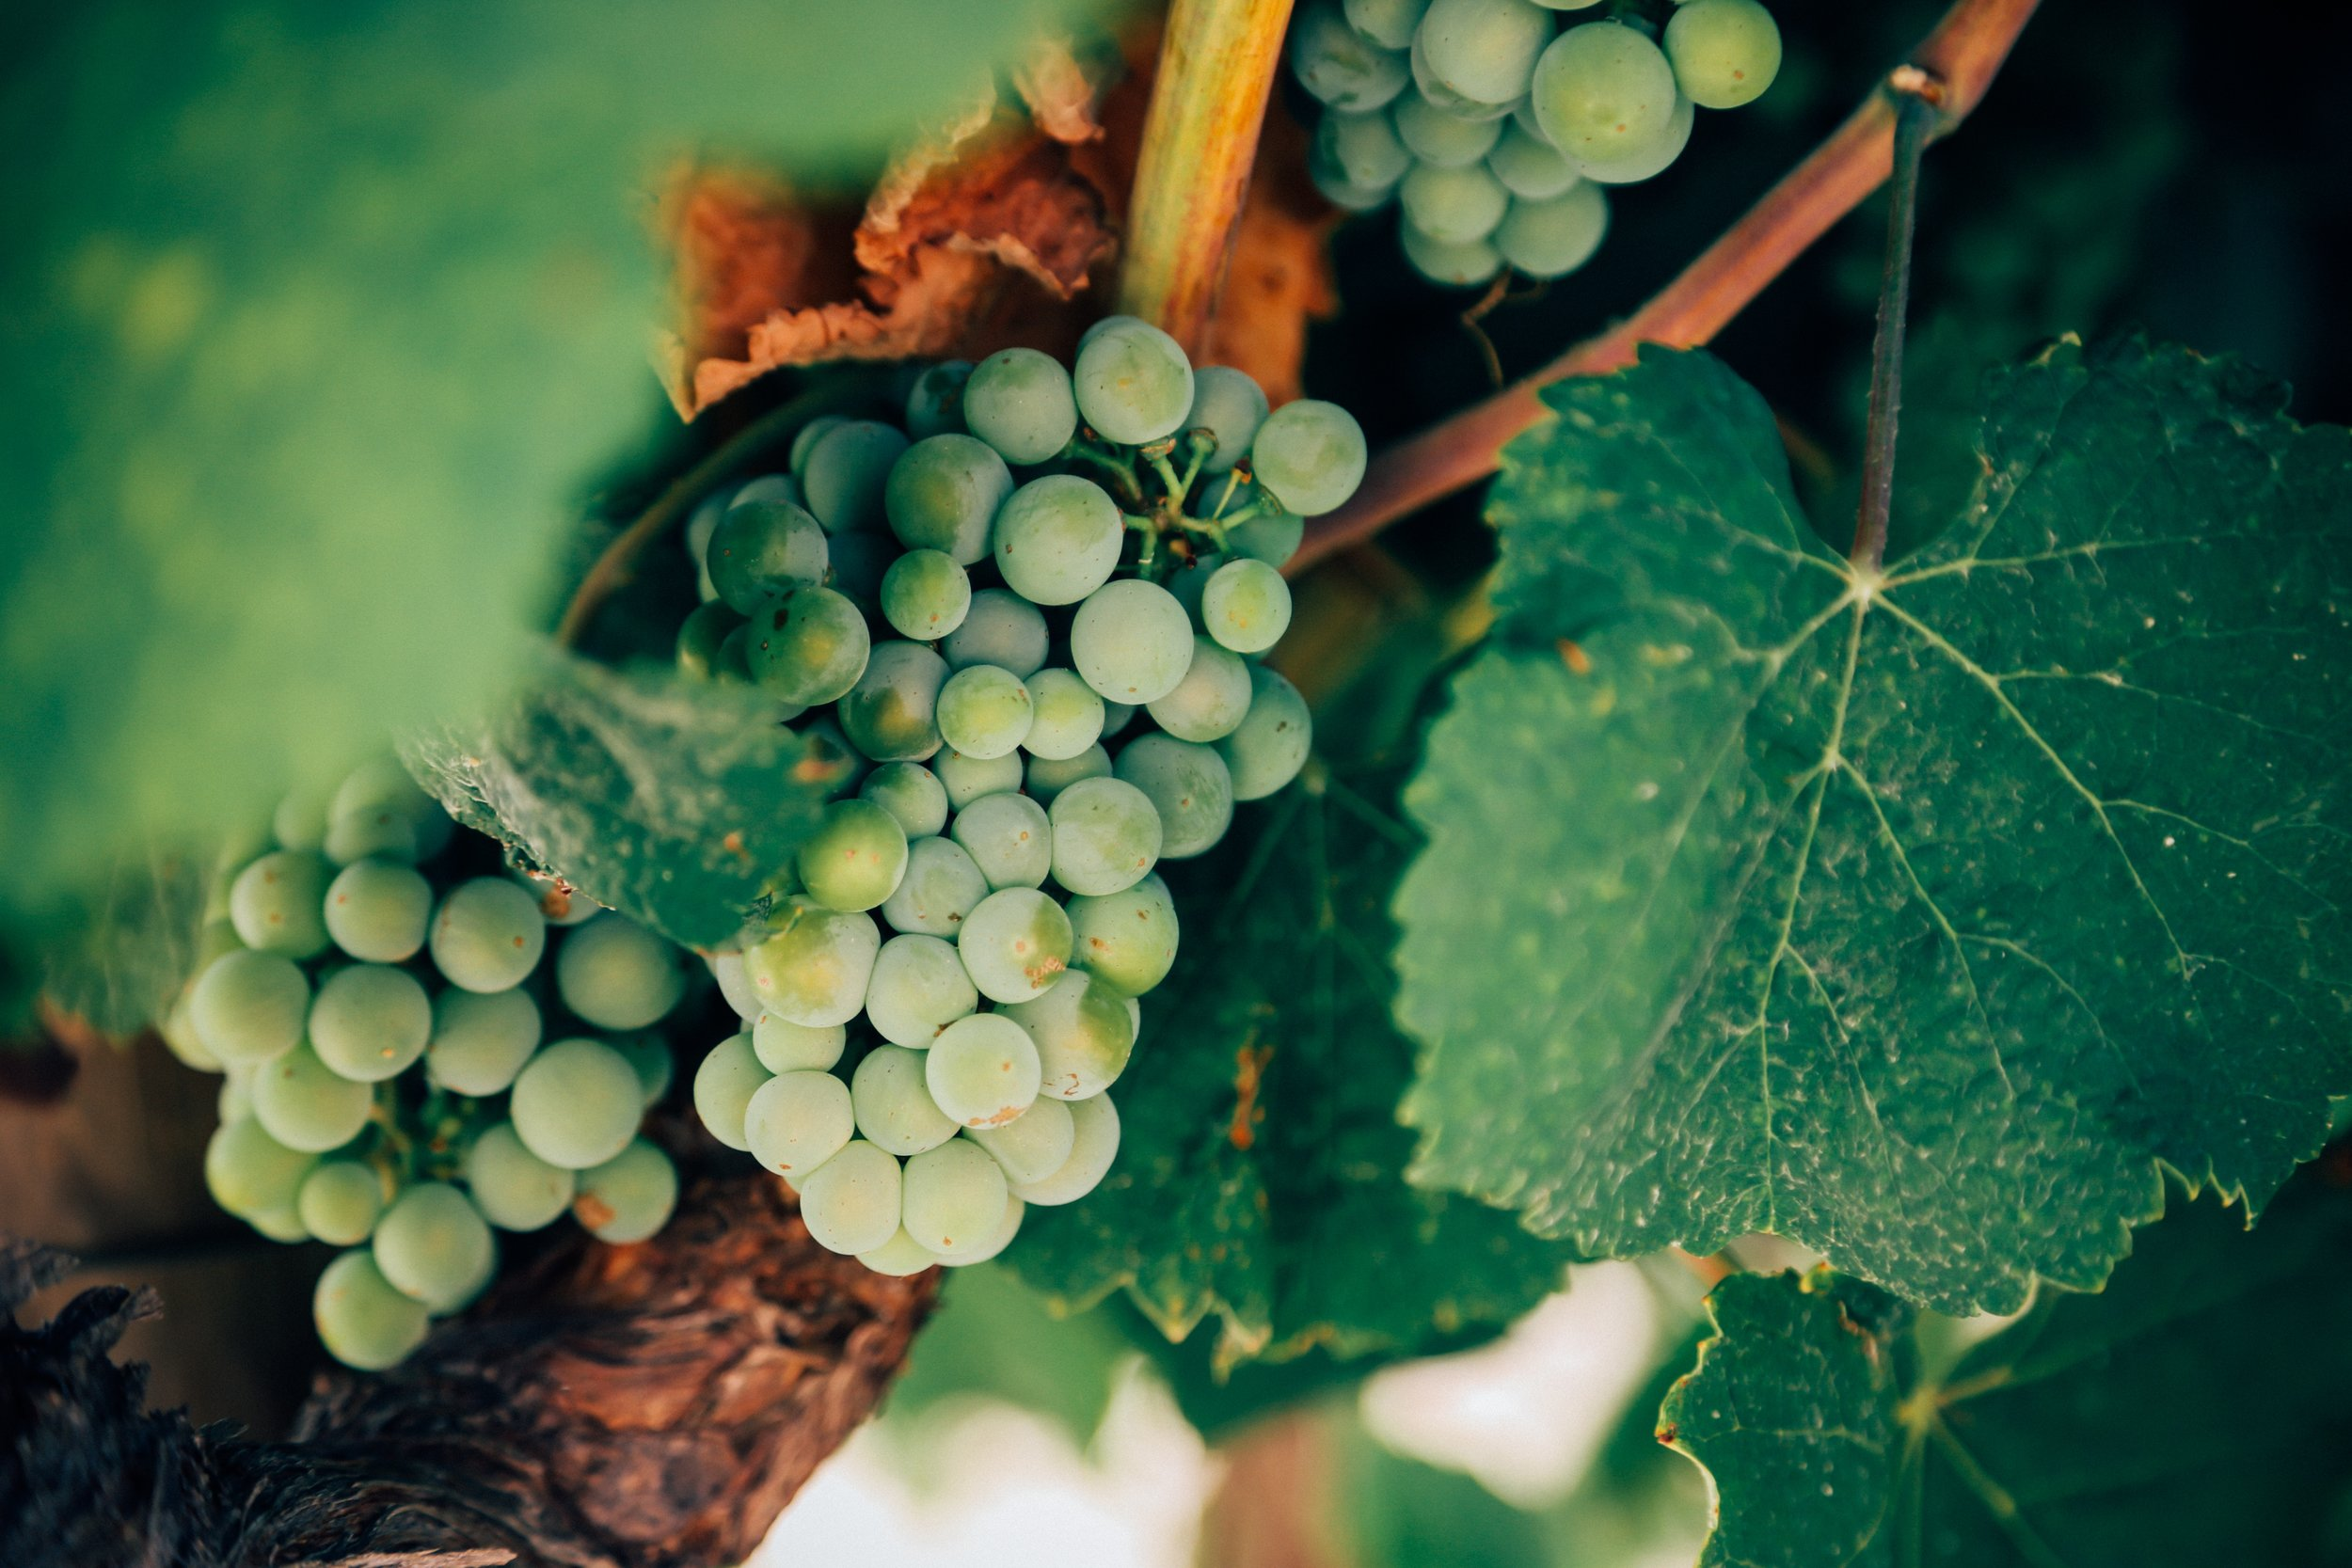 spokane-wine-club-wine-grapes-on-vine.jpg